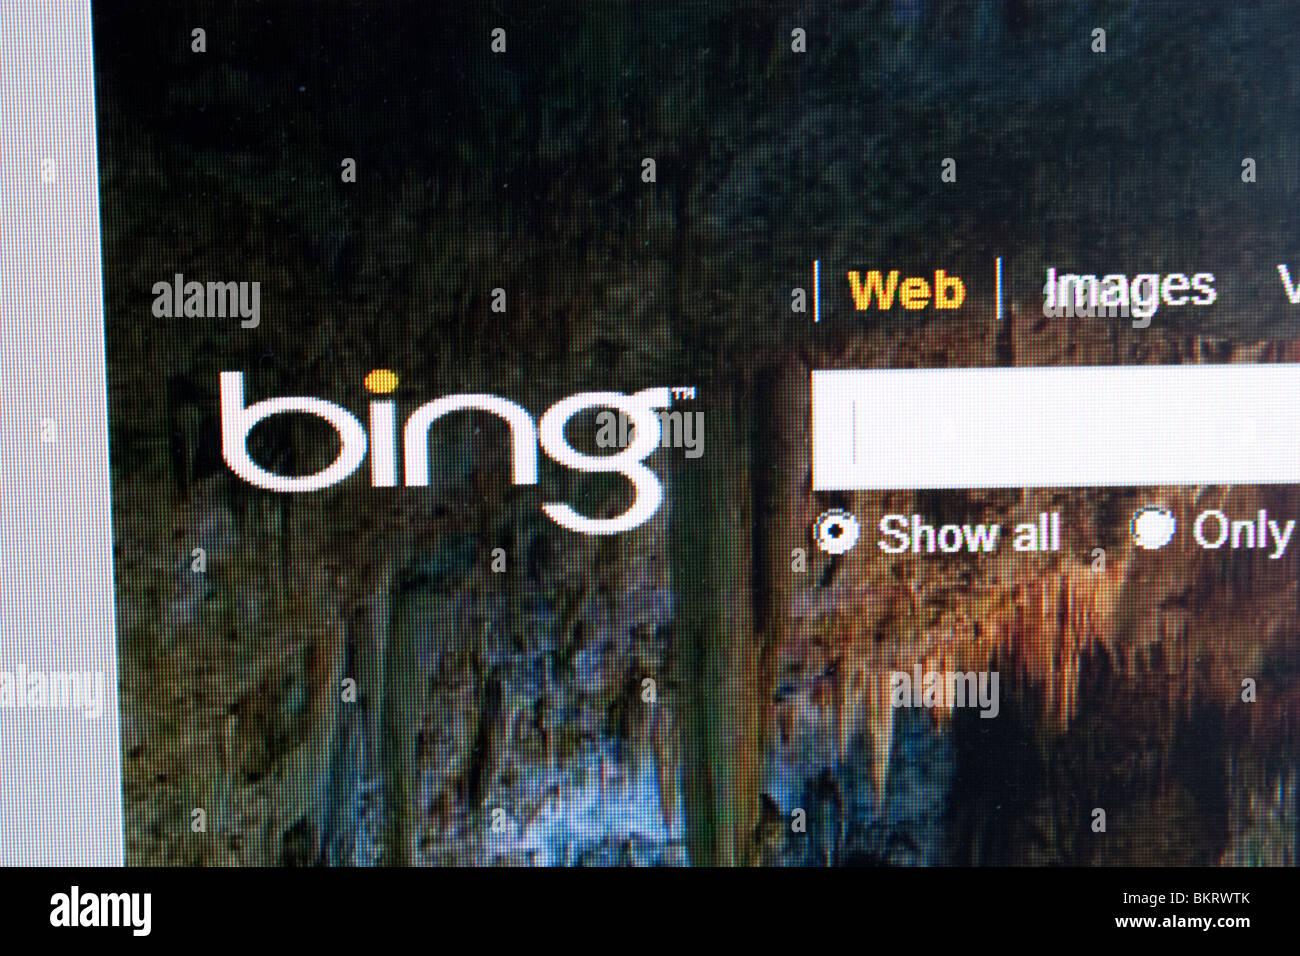 Microsoft bing search engine computer screen SEO - Stock Image